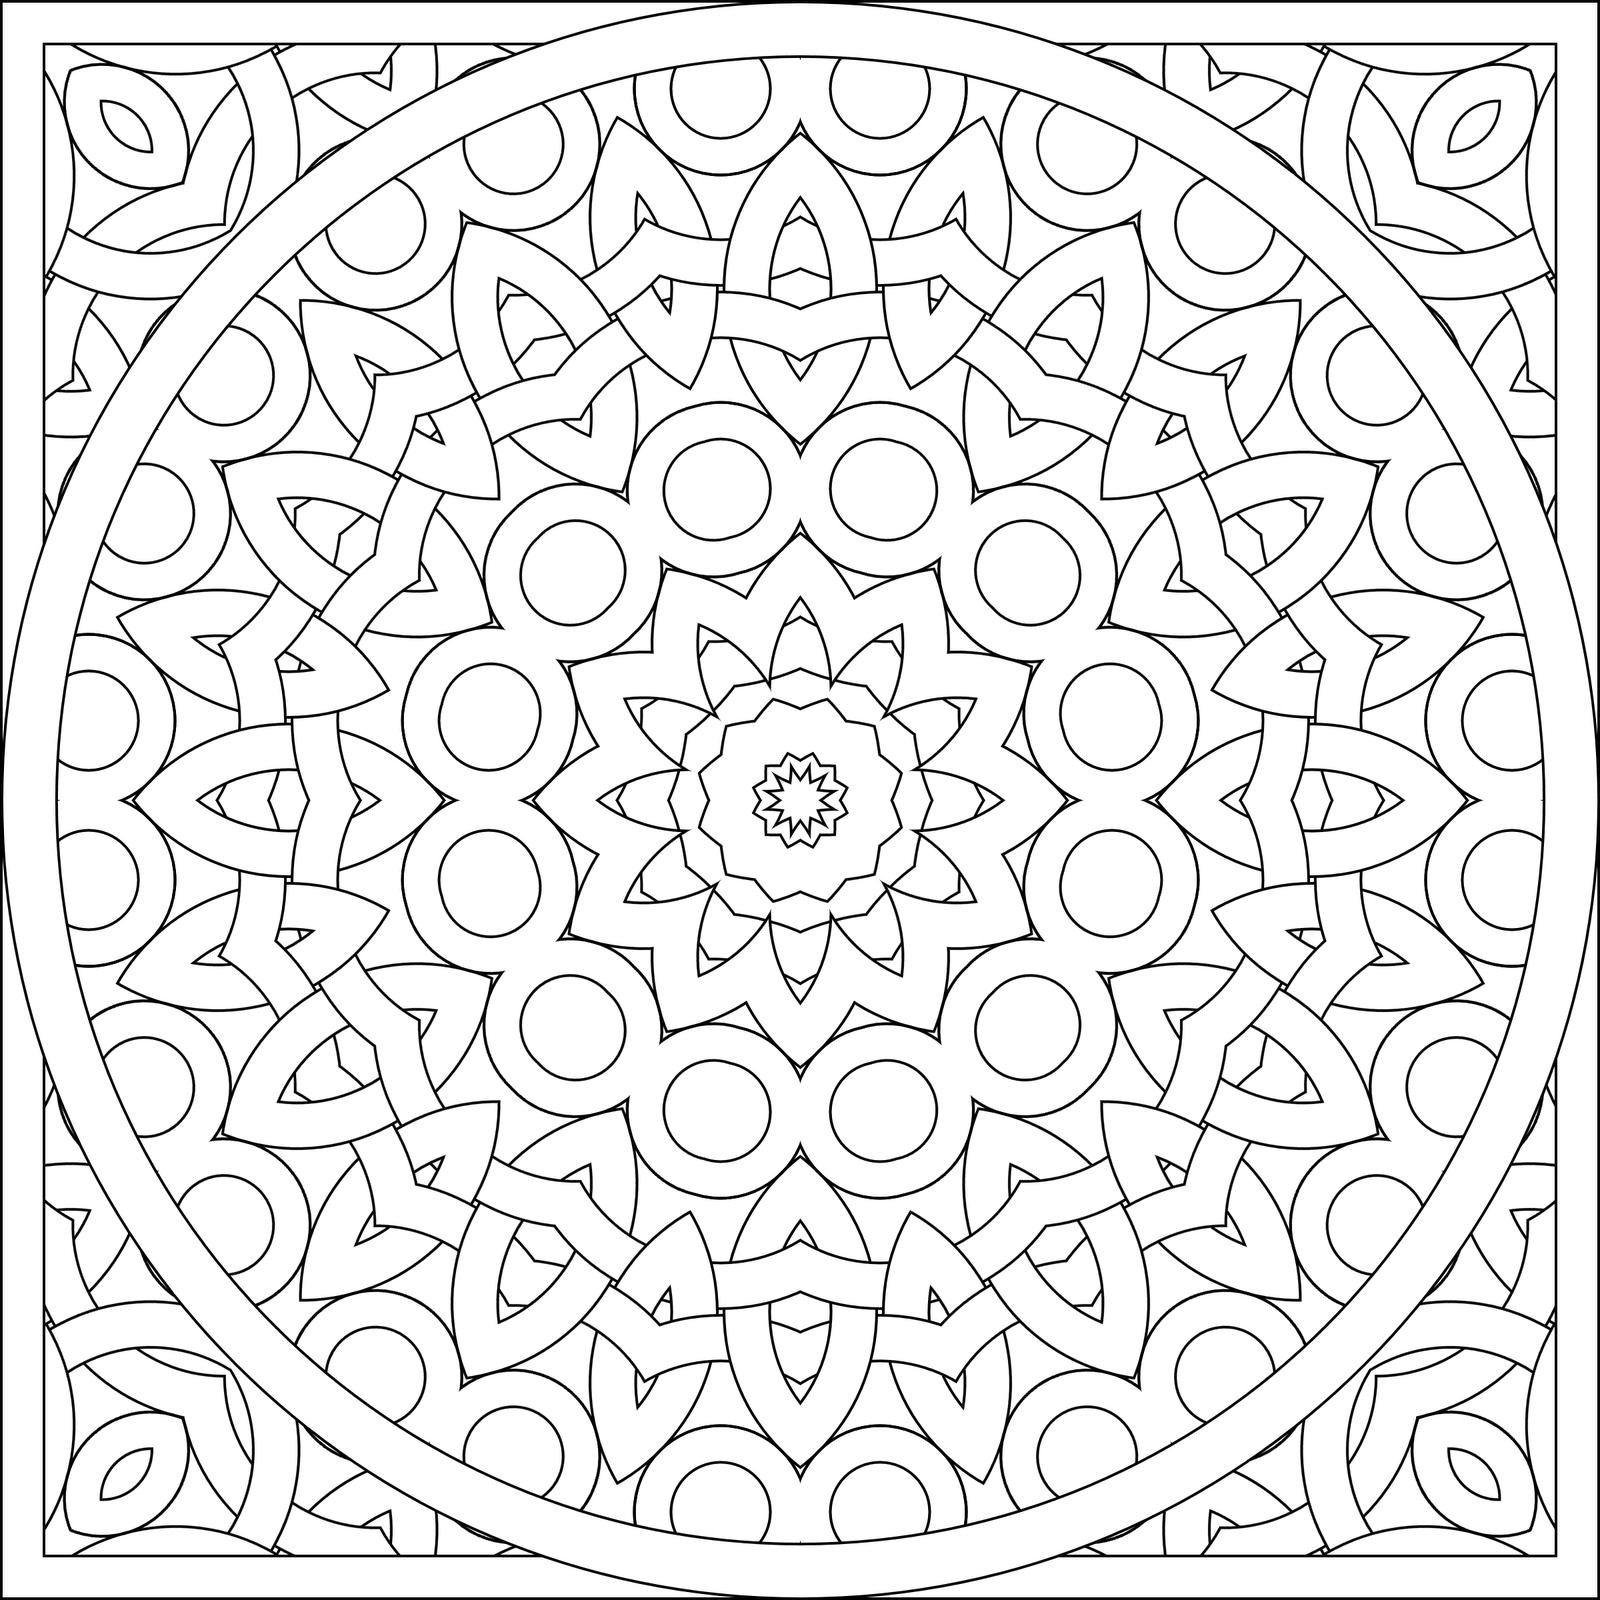 coloring circle patterns pattern coloring pages best coloring pages for kids circle patterns coloring